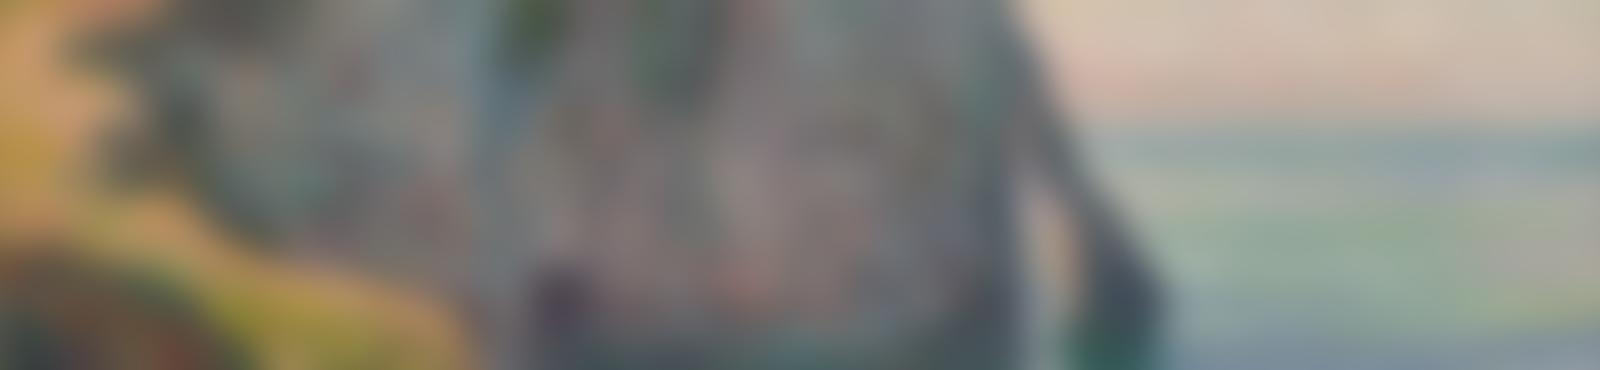 Blurred bf84bd4c cdb2 4c09 8b82 5147c0486655